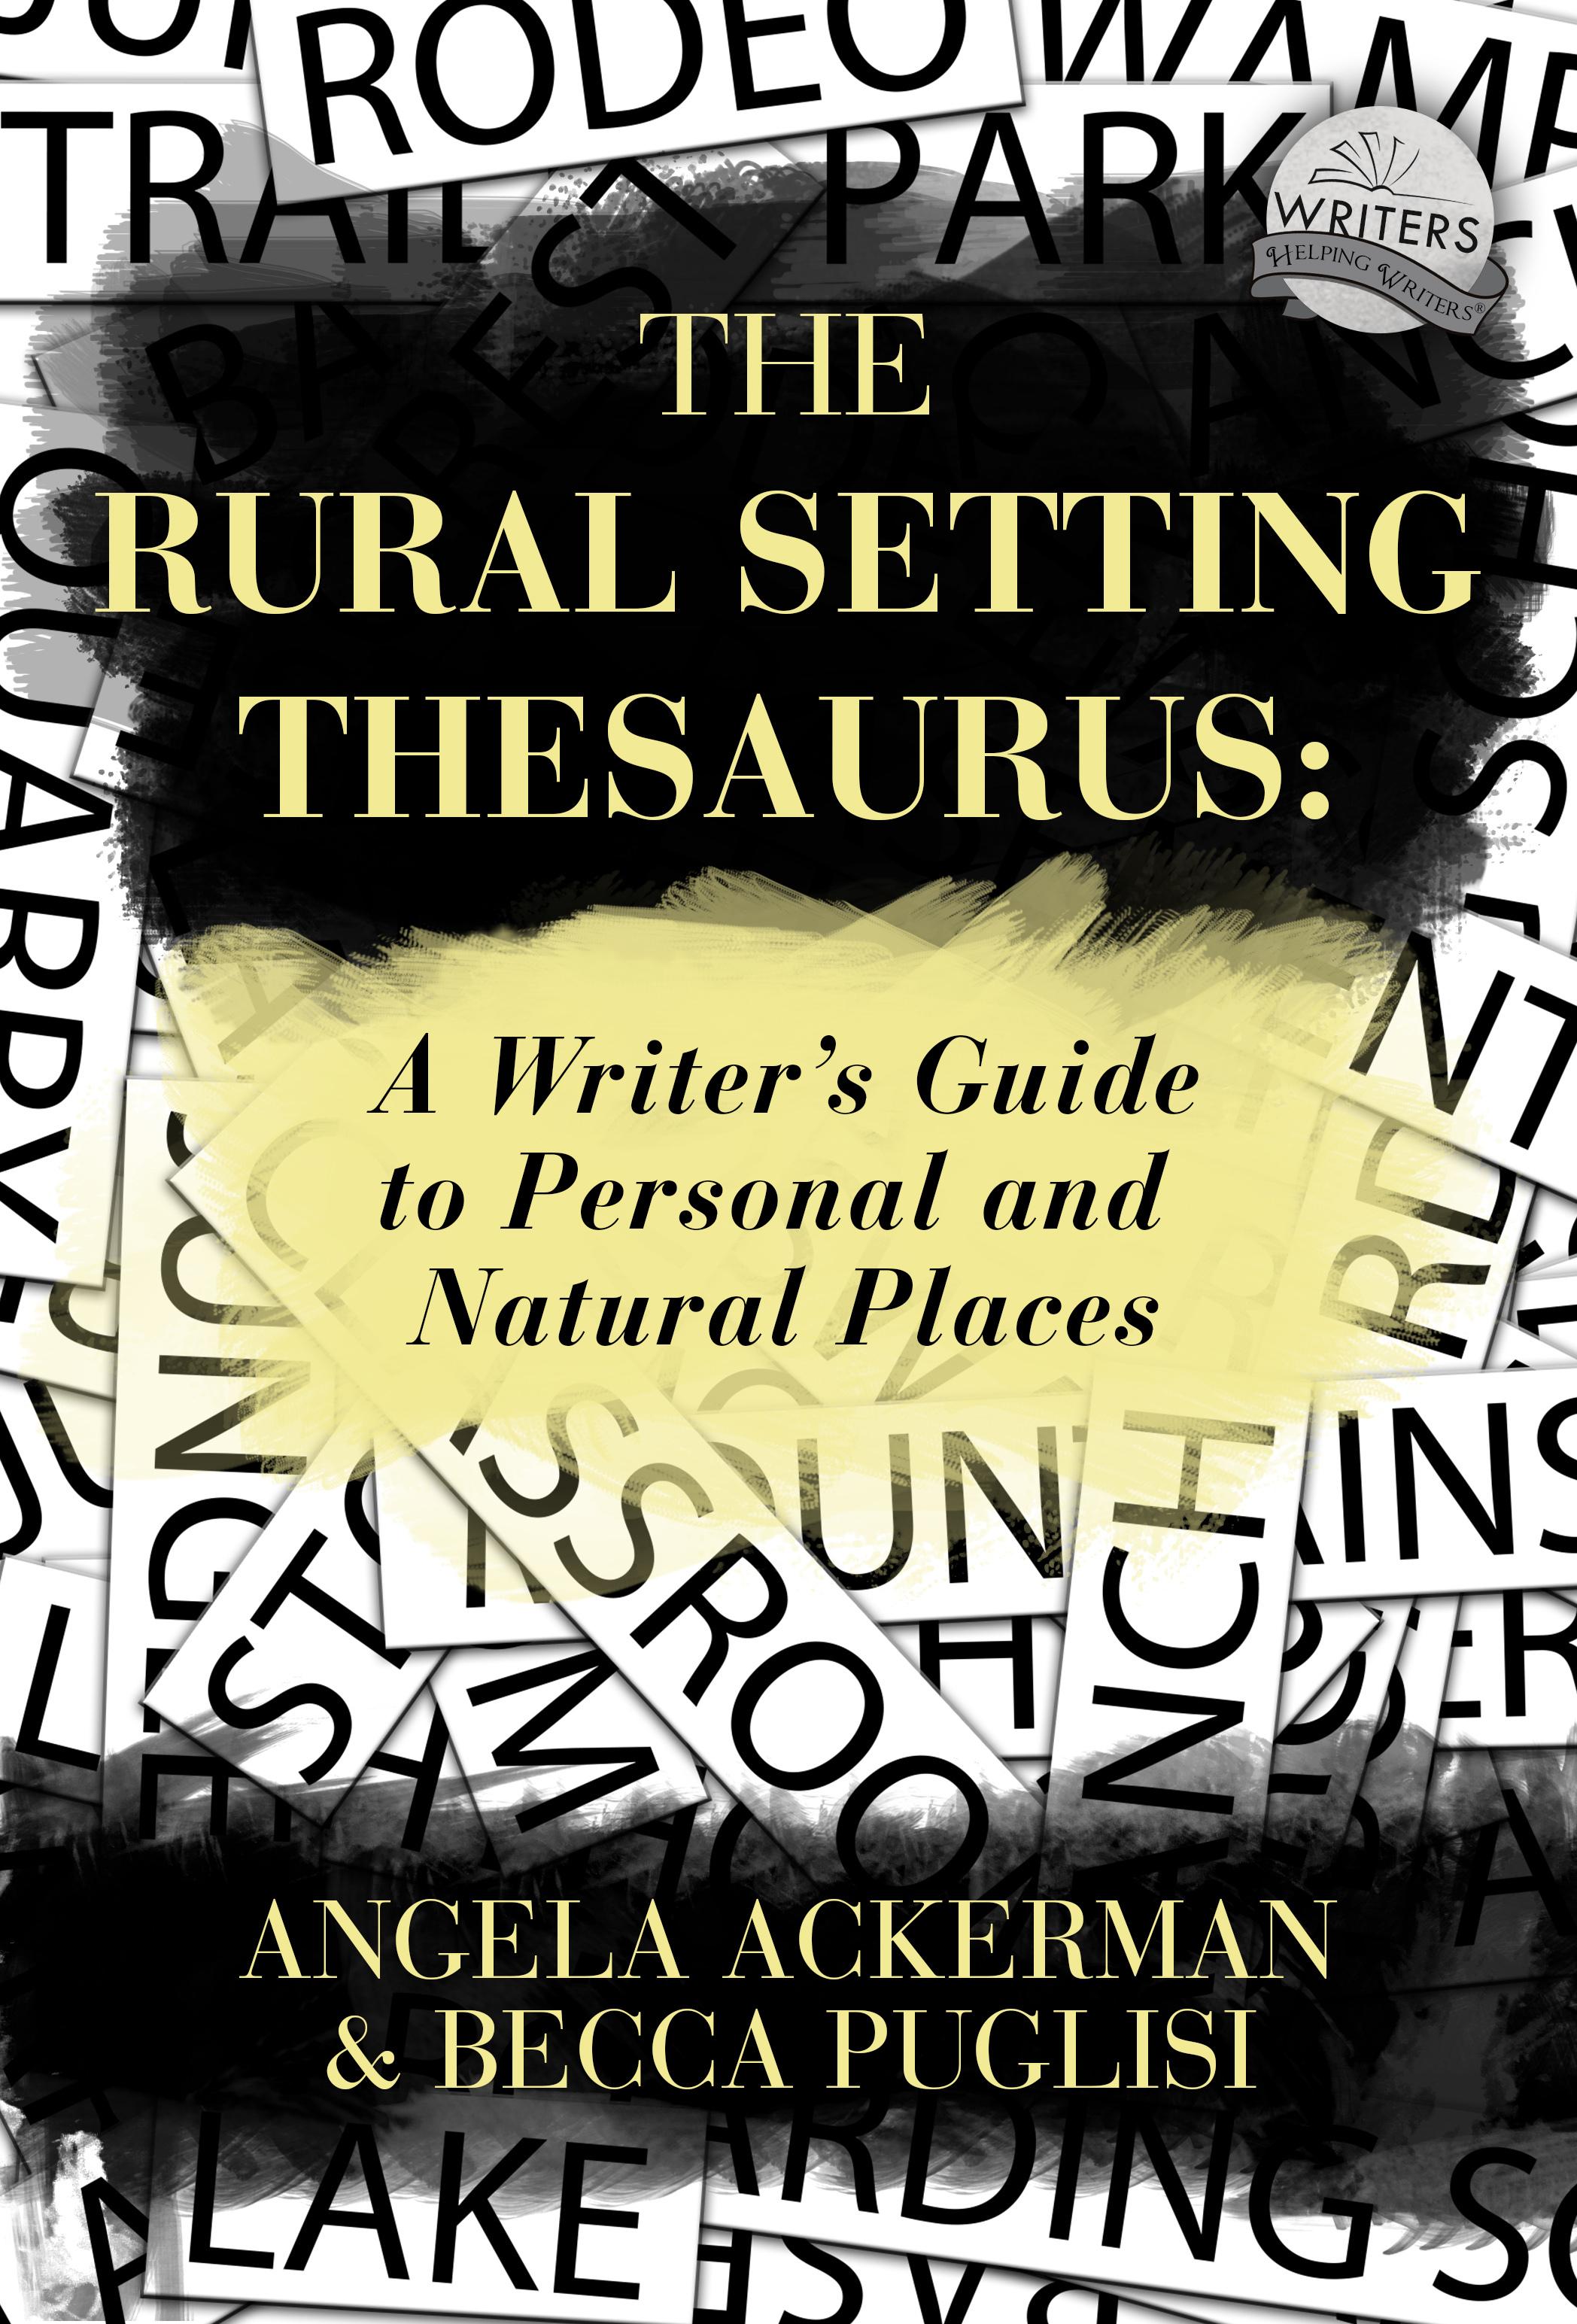 The Rural Setting Thesaurus